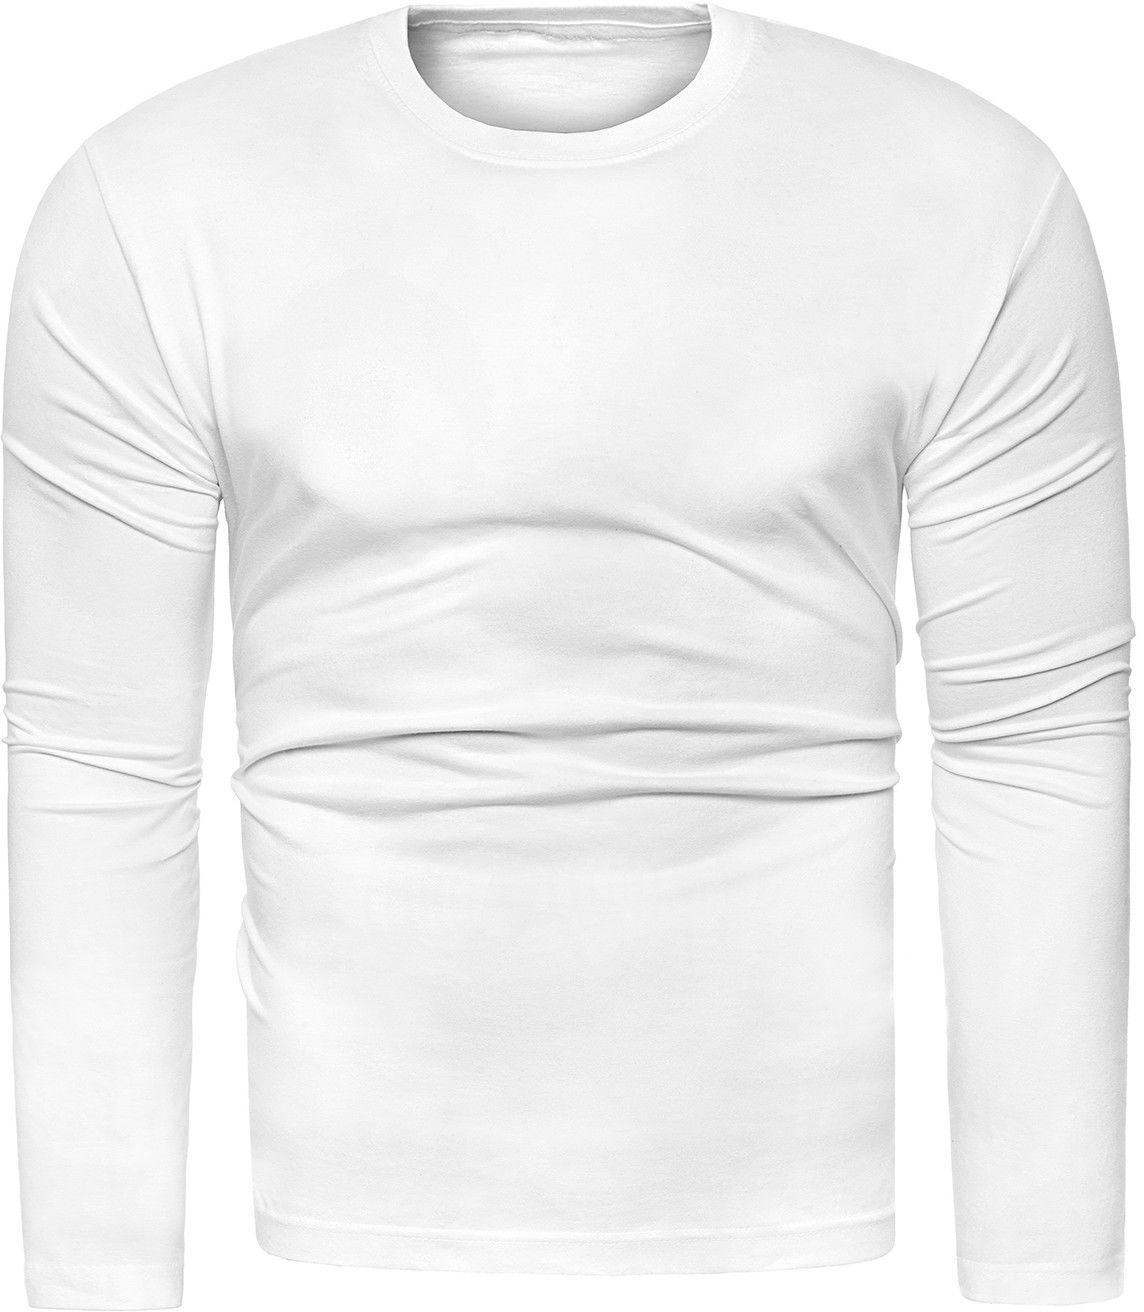 Bluza męska longsleeve N01L - biała